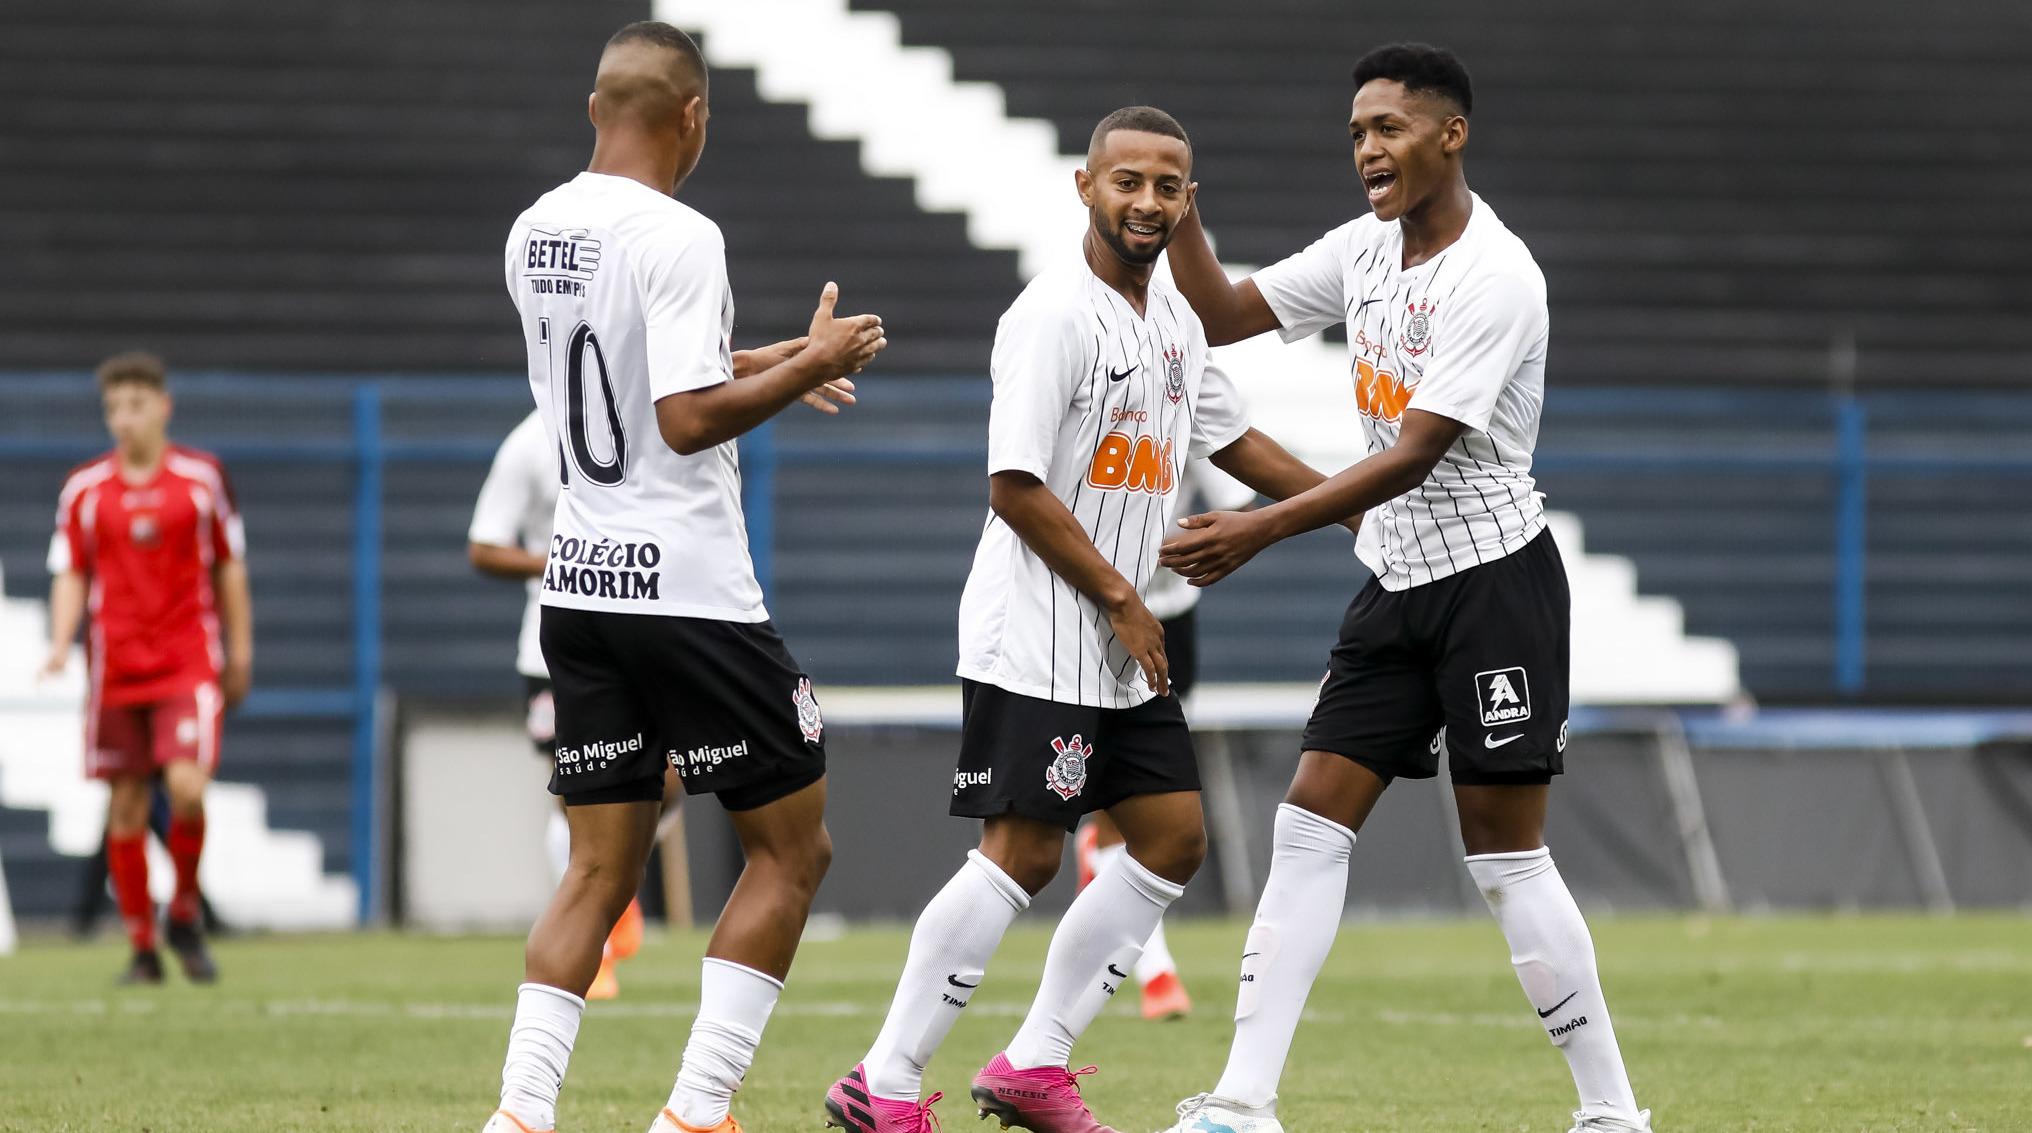 Paulista Sub-17: Primavera x Corinthians - Quartas de Final - Ida